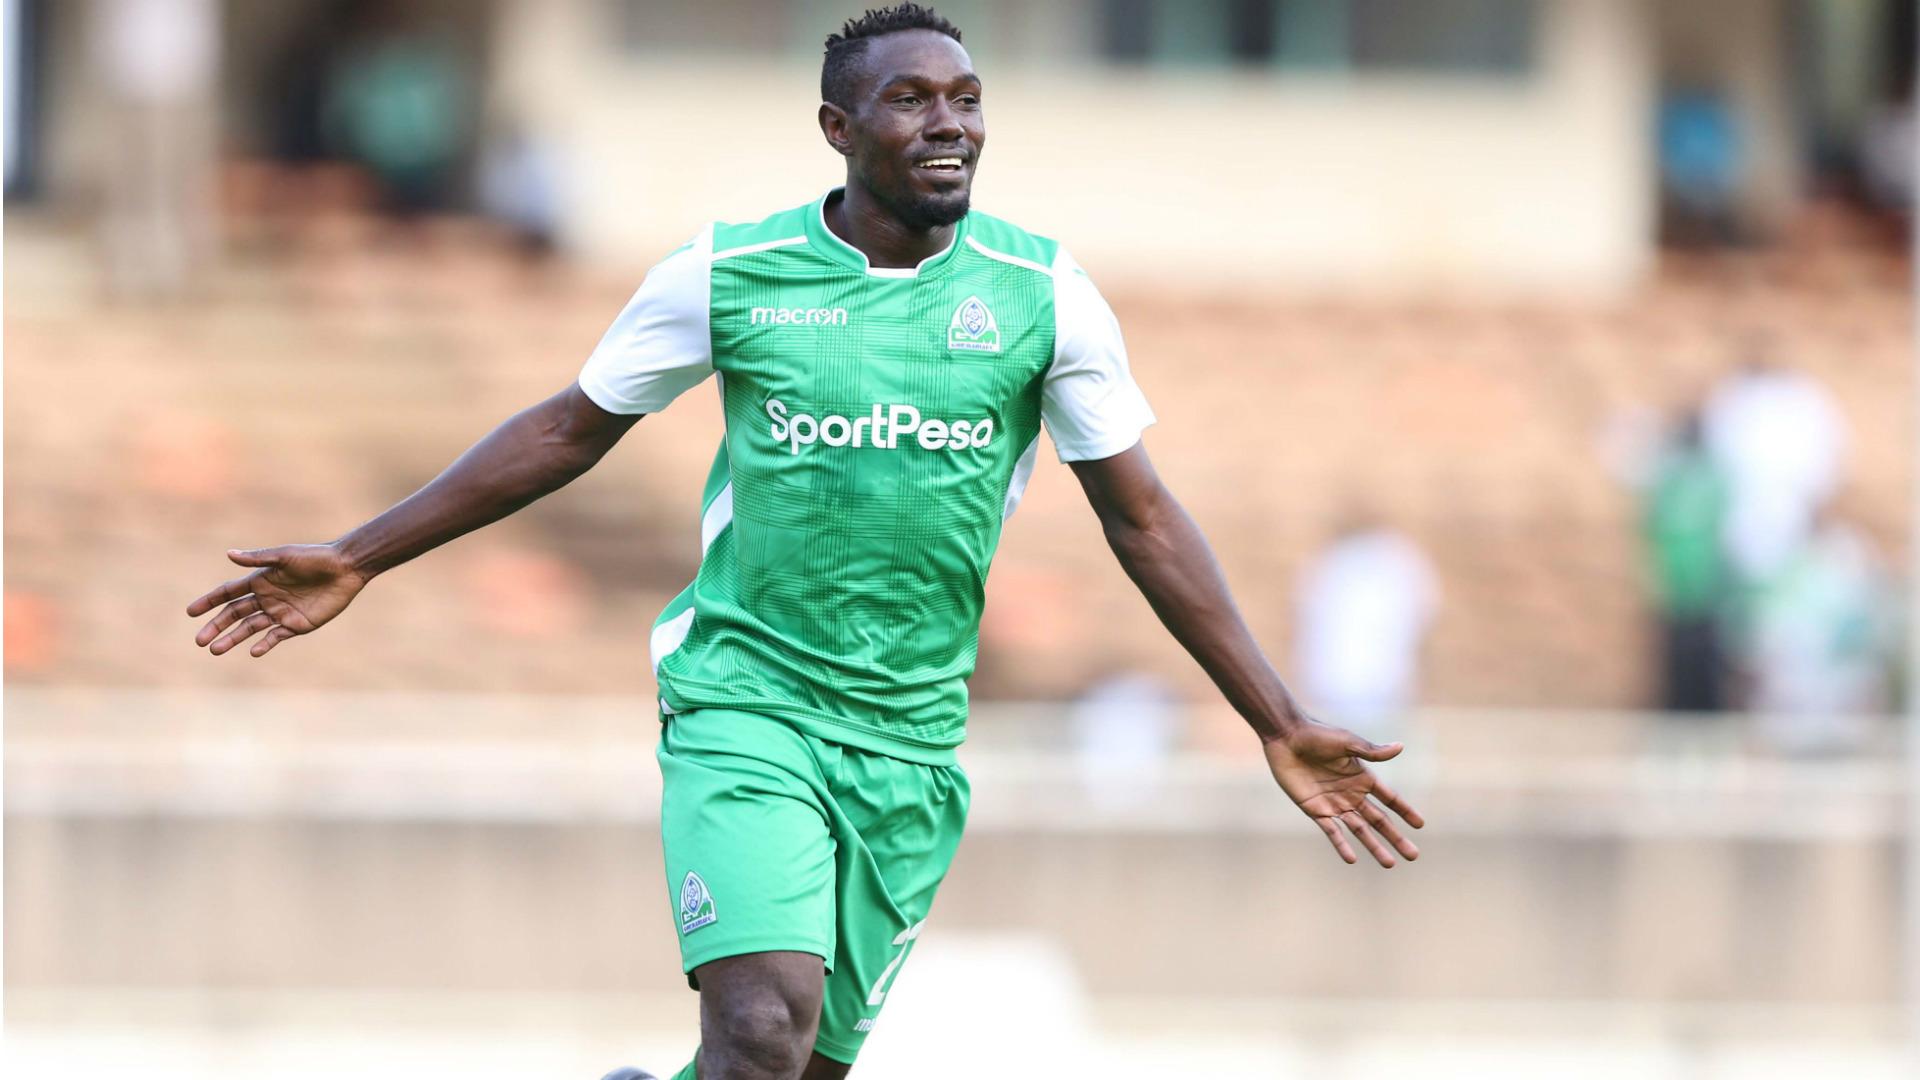 Ssekisambu scored five goals for Gor Mahia, last season. (PHOTOS/Courtesy)